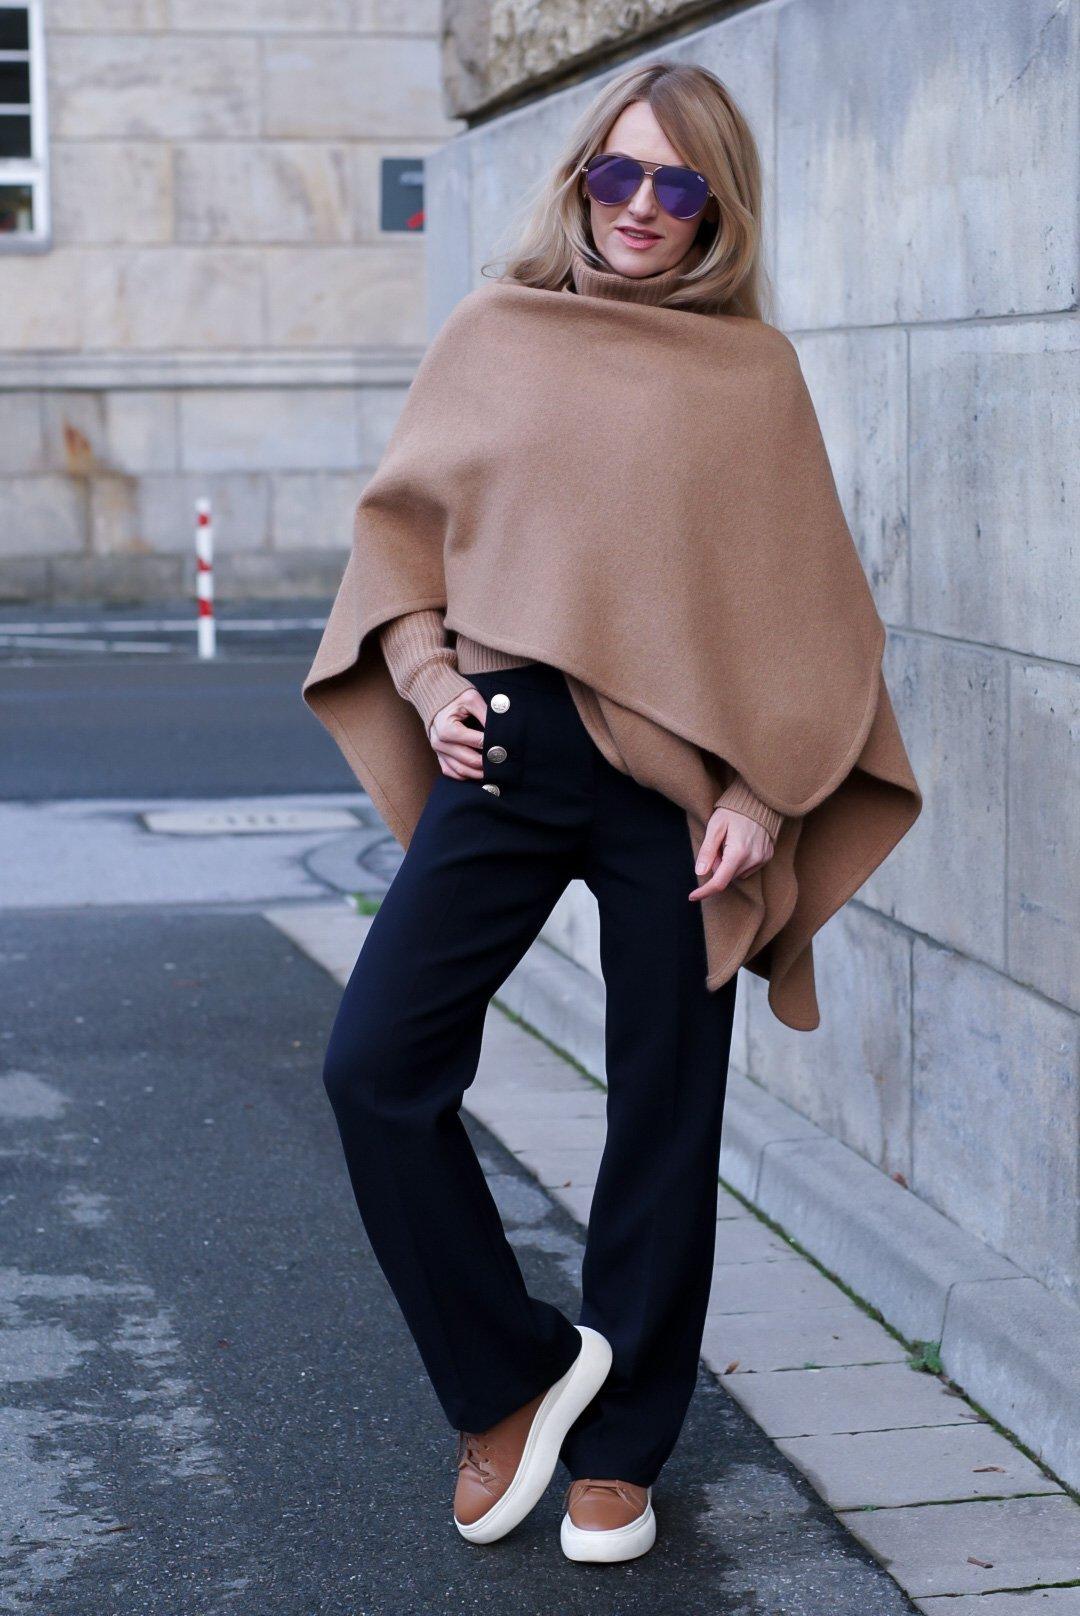 Howahrde-Fasion-Wuppertal-Atelier-Cape-Fashion-Seductive-Hose-Lisa-Yang-Kaschmir-Pullover-Santoni-Sneaker